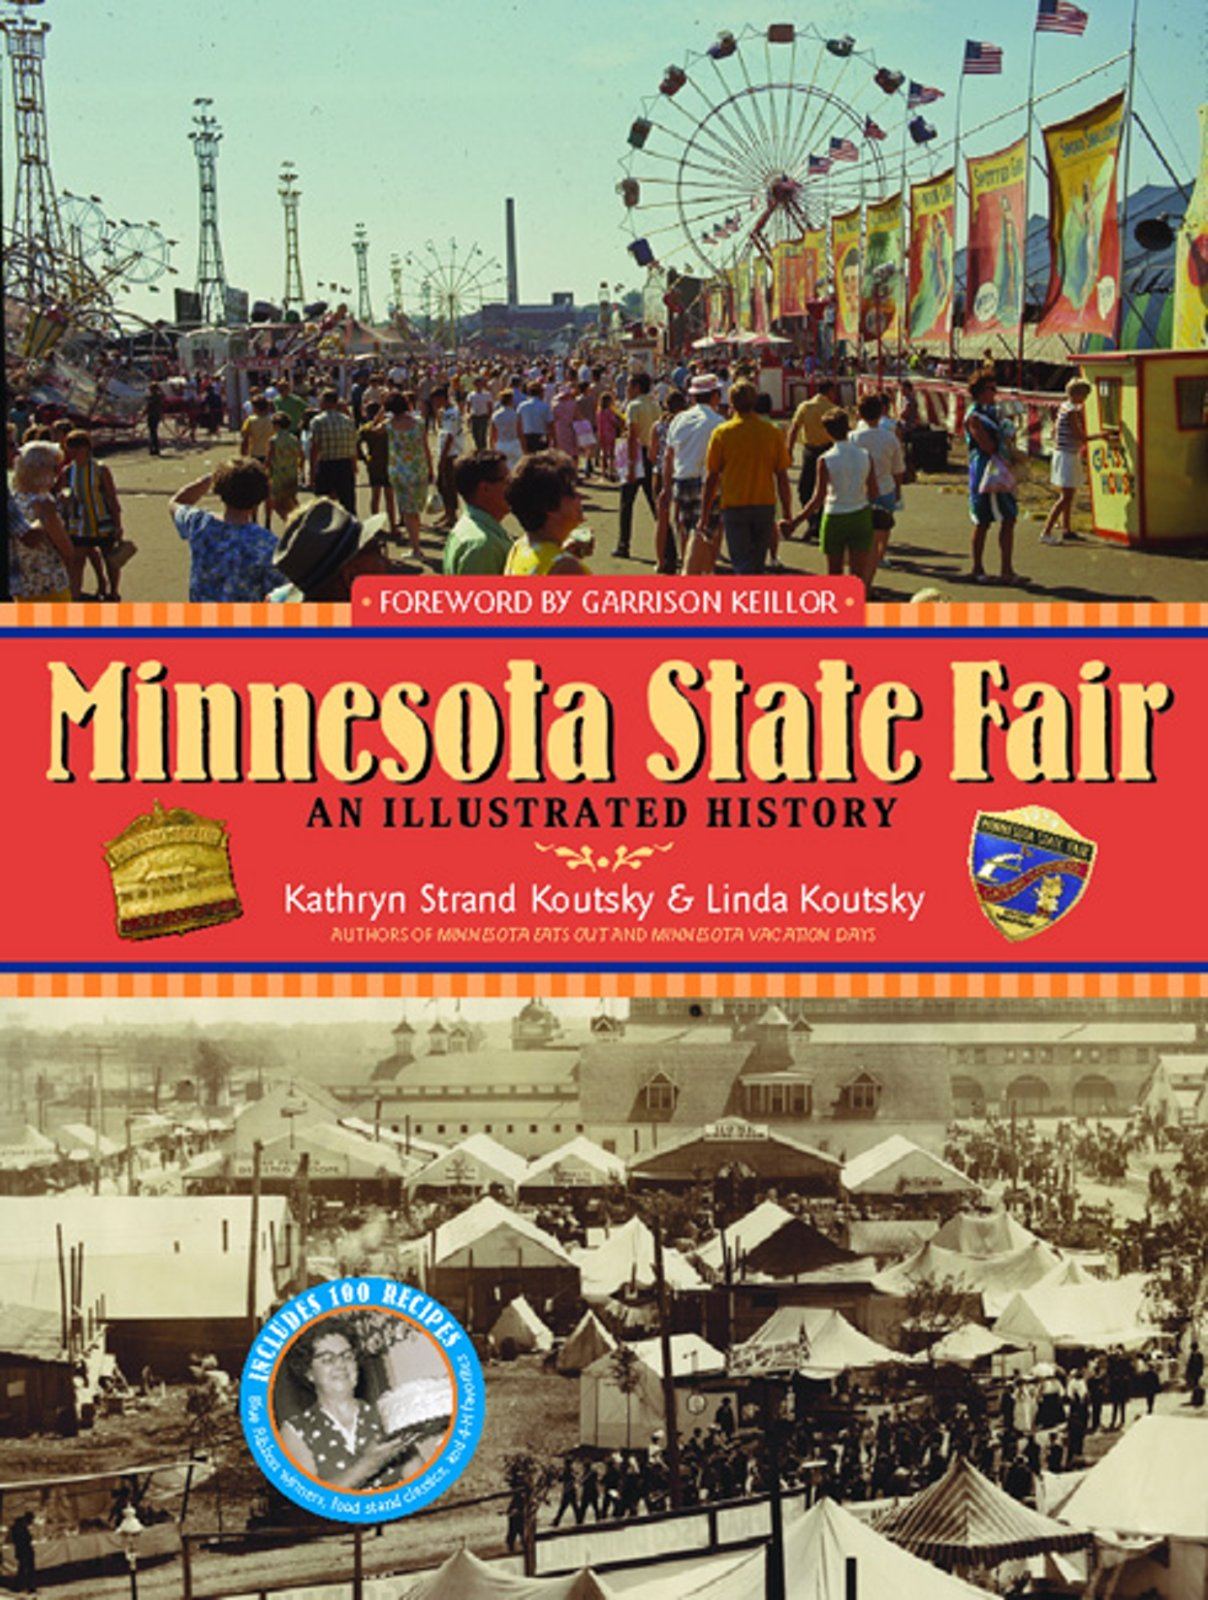 Buy Minnesota State Fair Now!